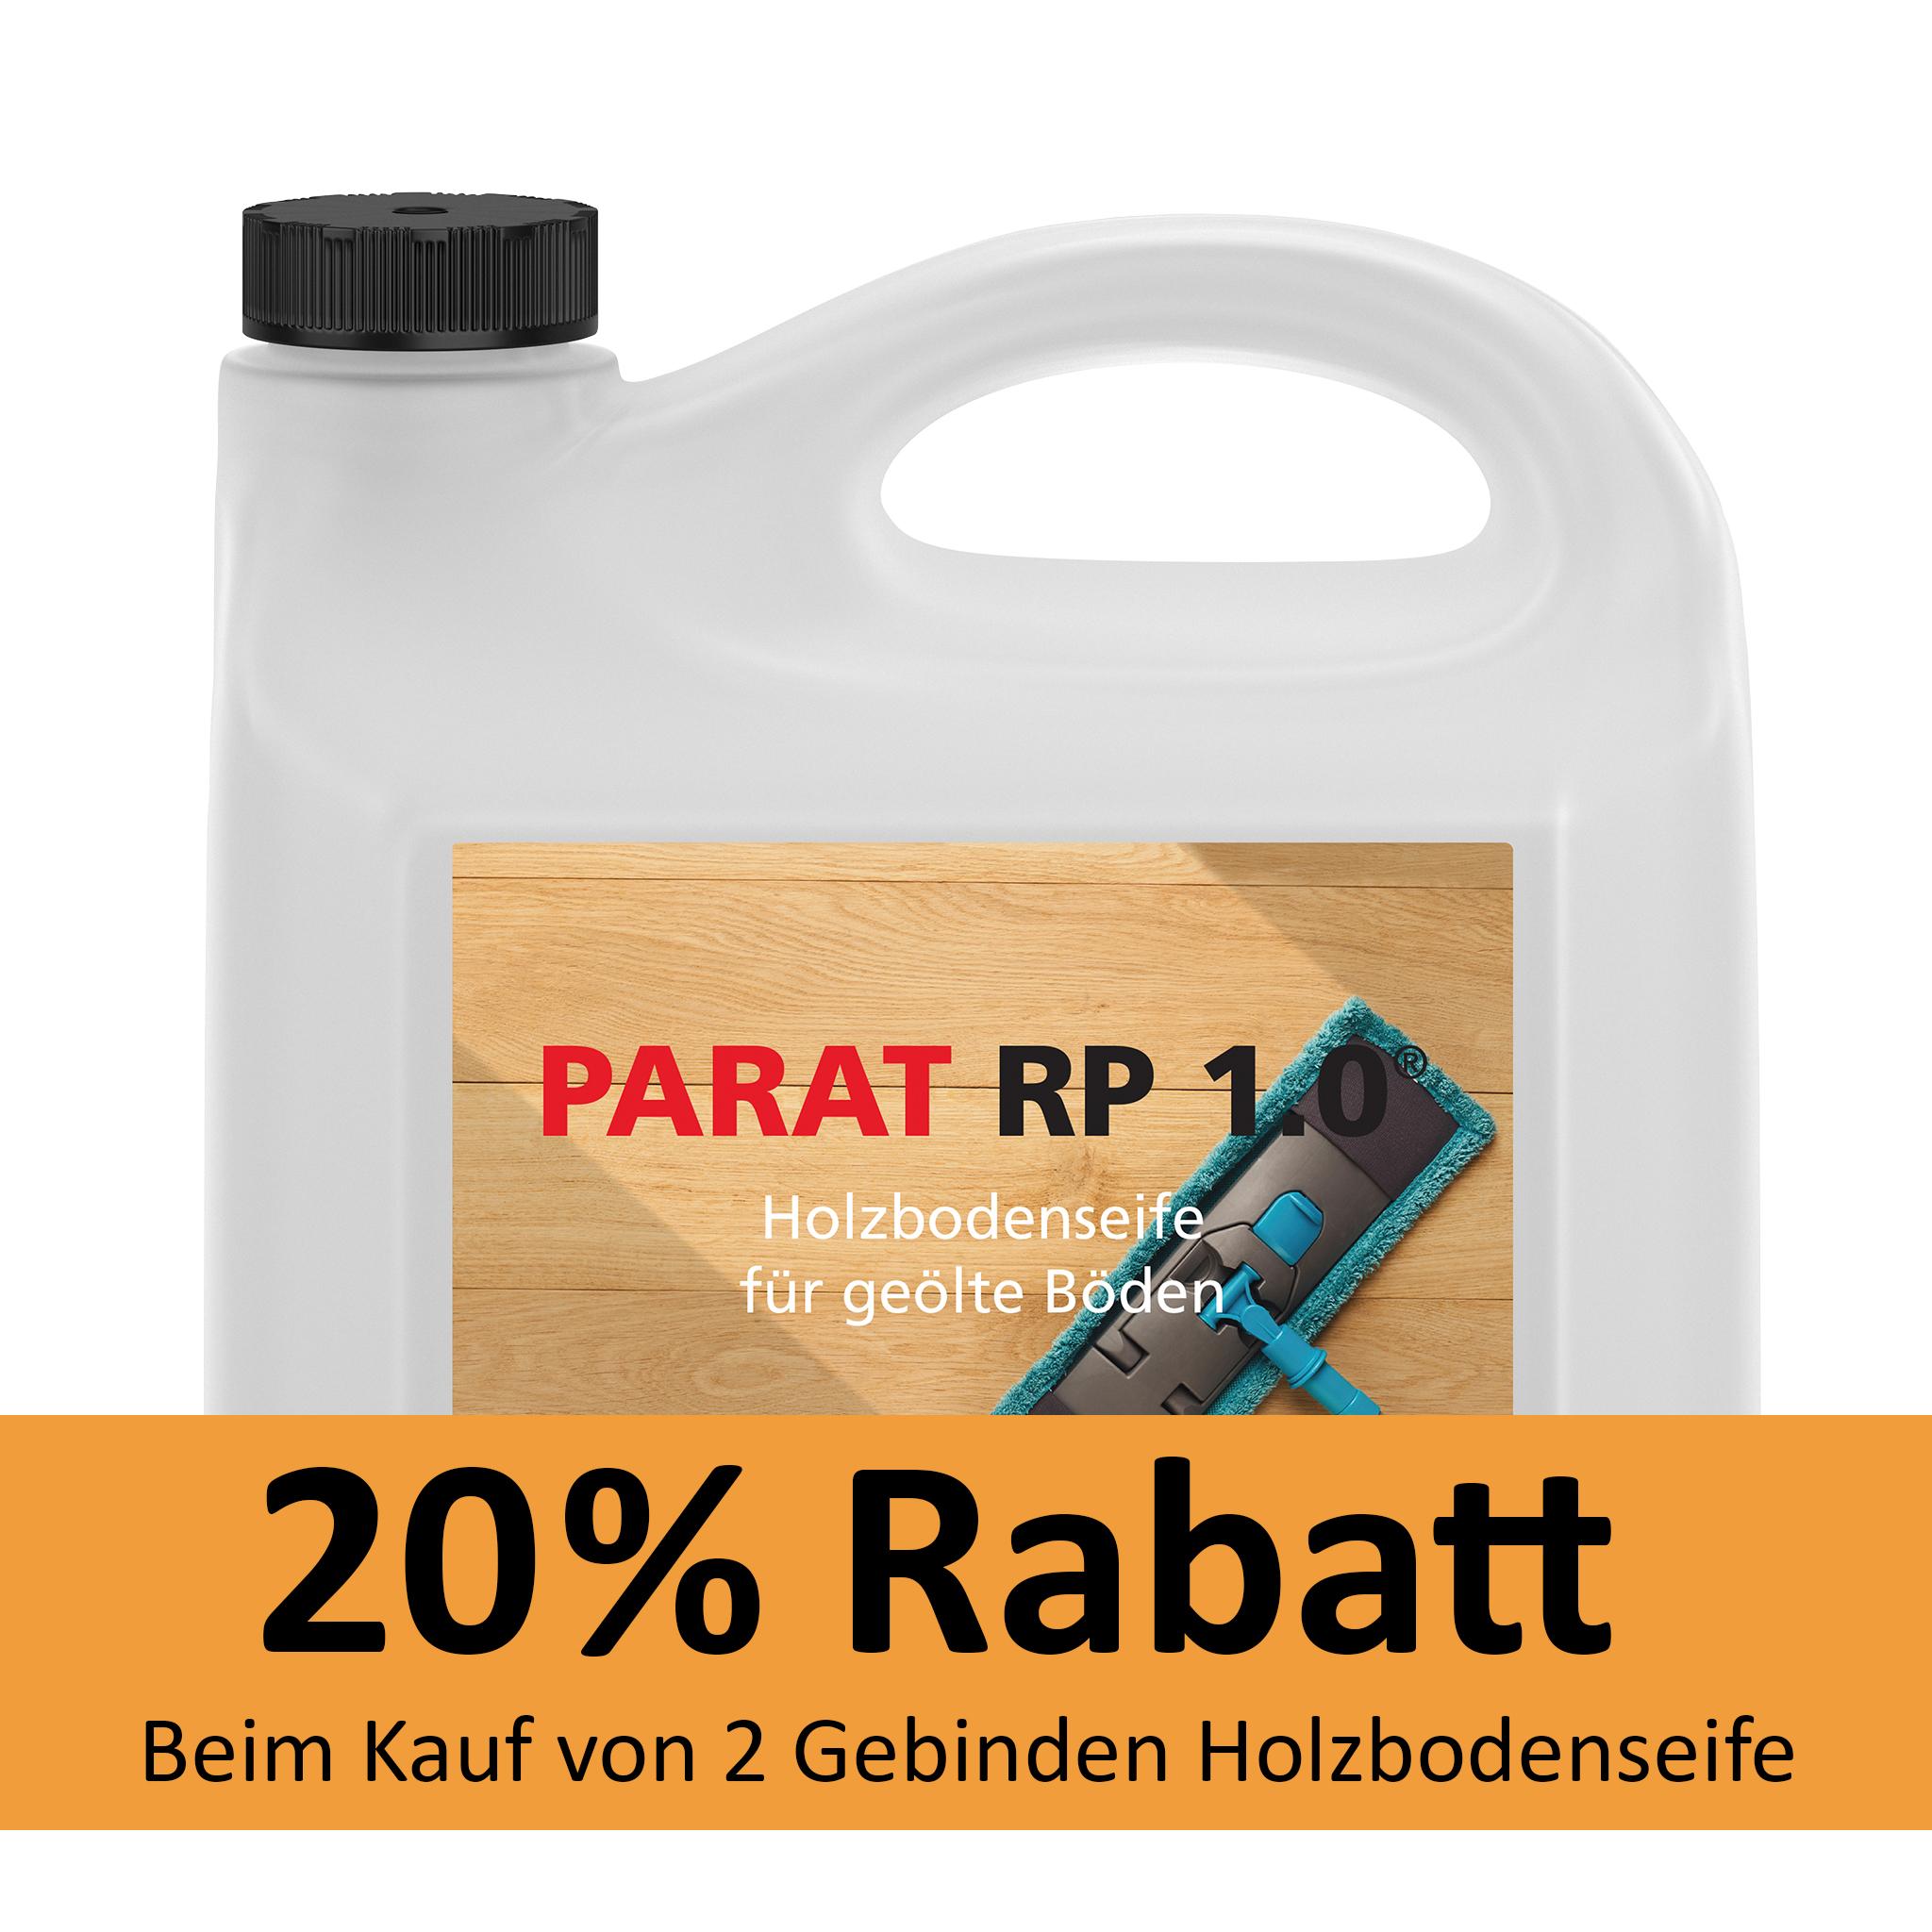 PARAT RP 1.0 Holzbodenseife 2,5 Ltr.